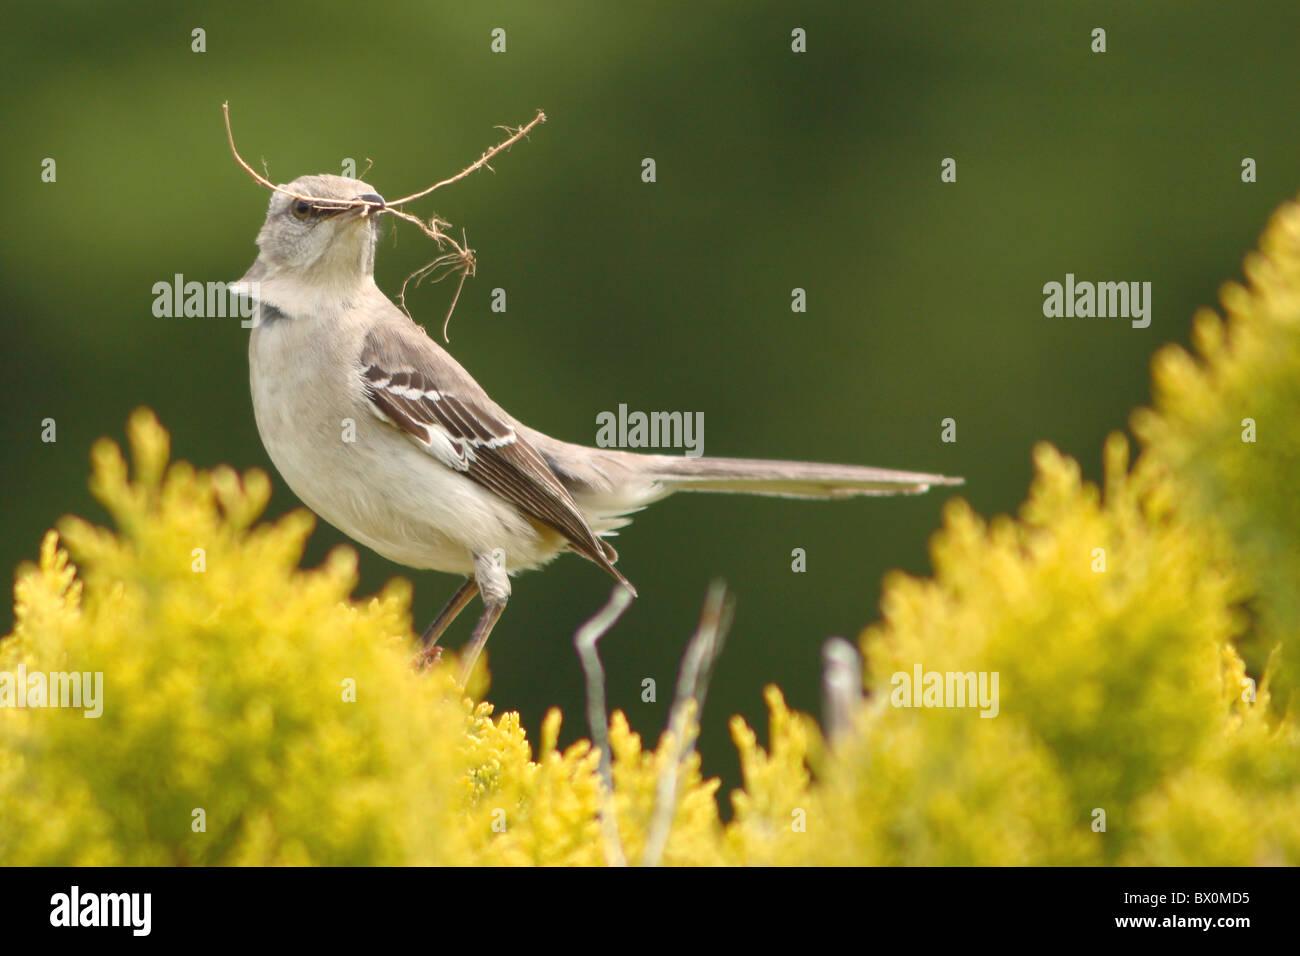 A Northern Mockingbird bringing nesting materials to nest. Stock Photo